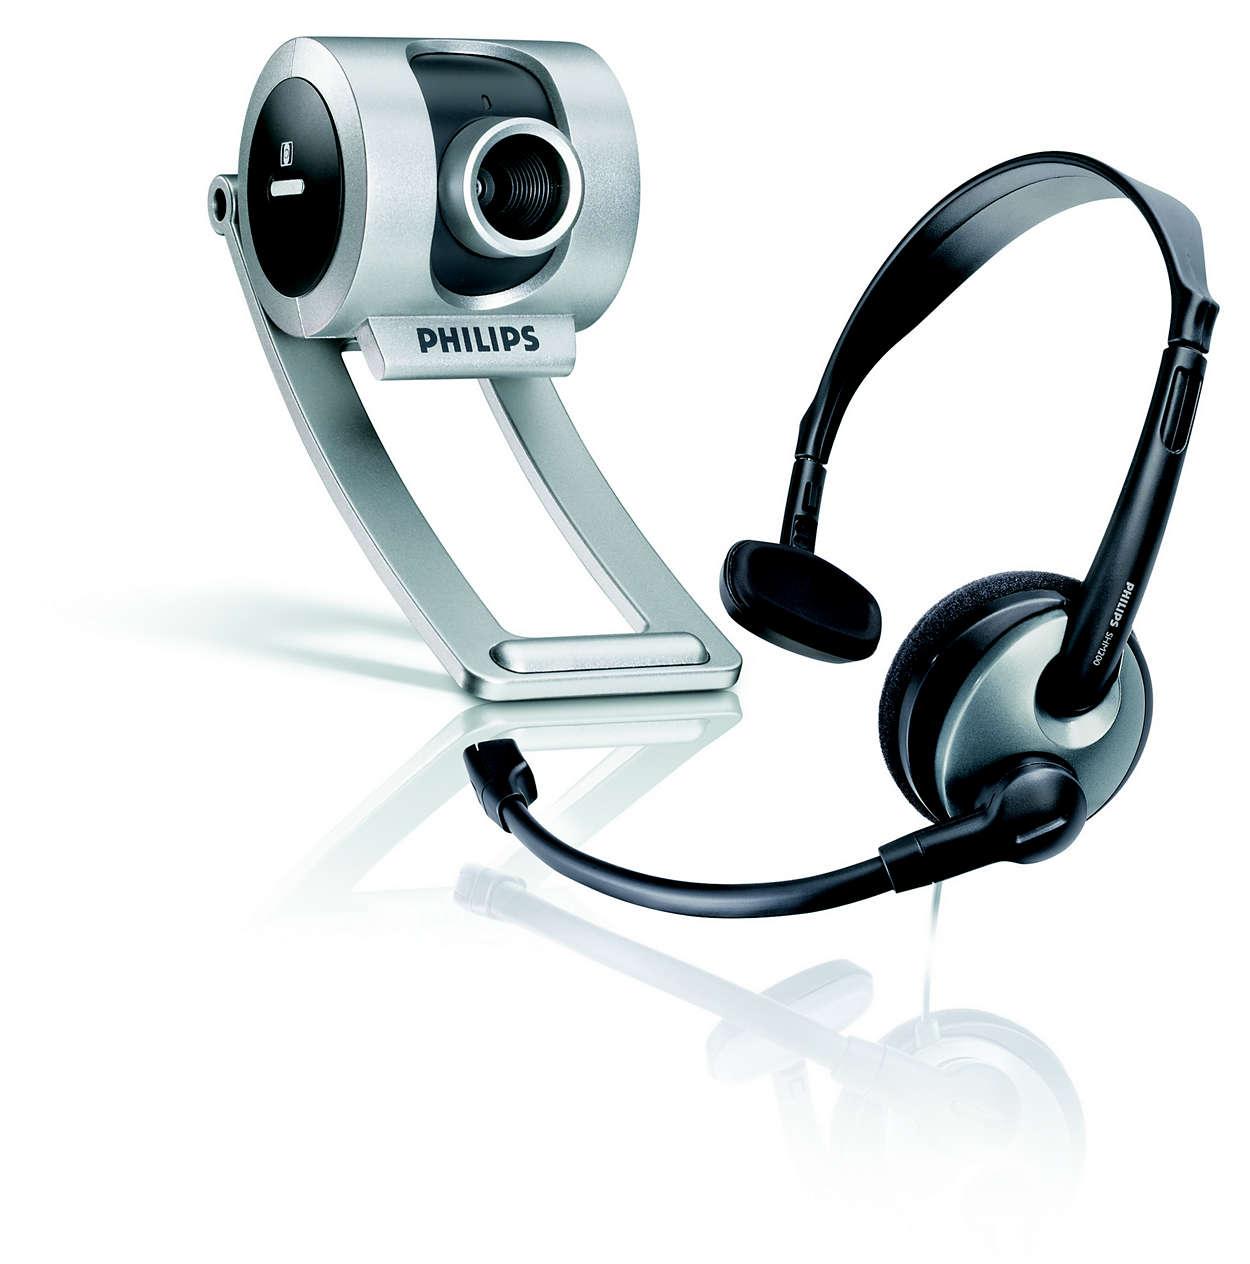 Indulhat a Skype-cset